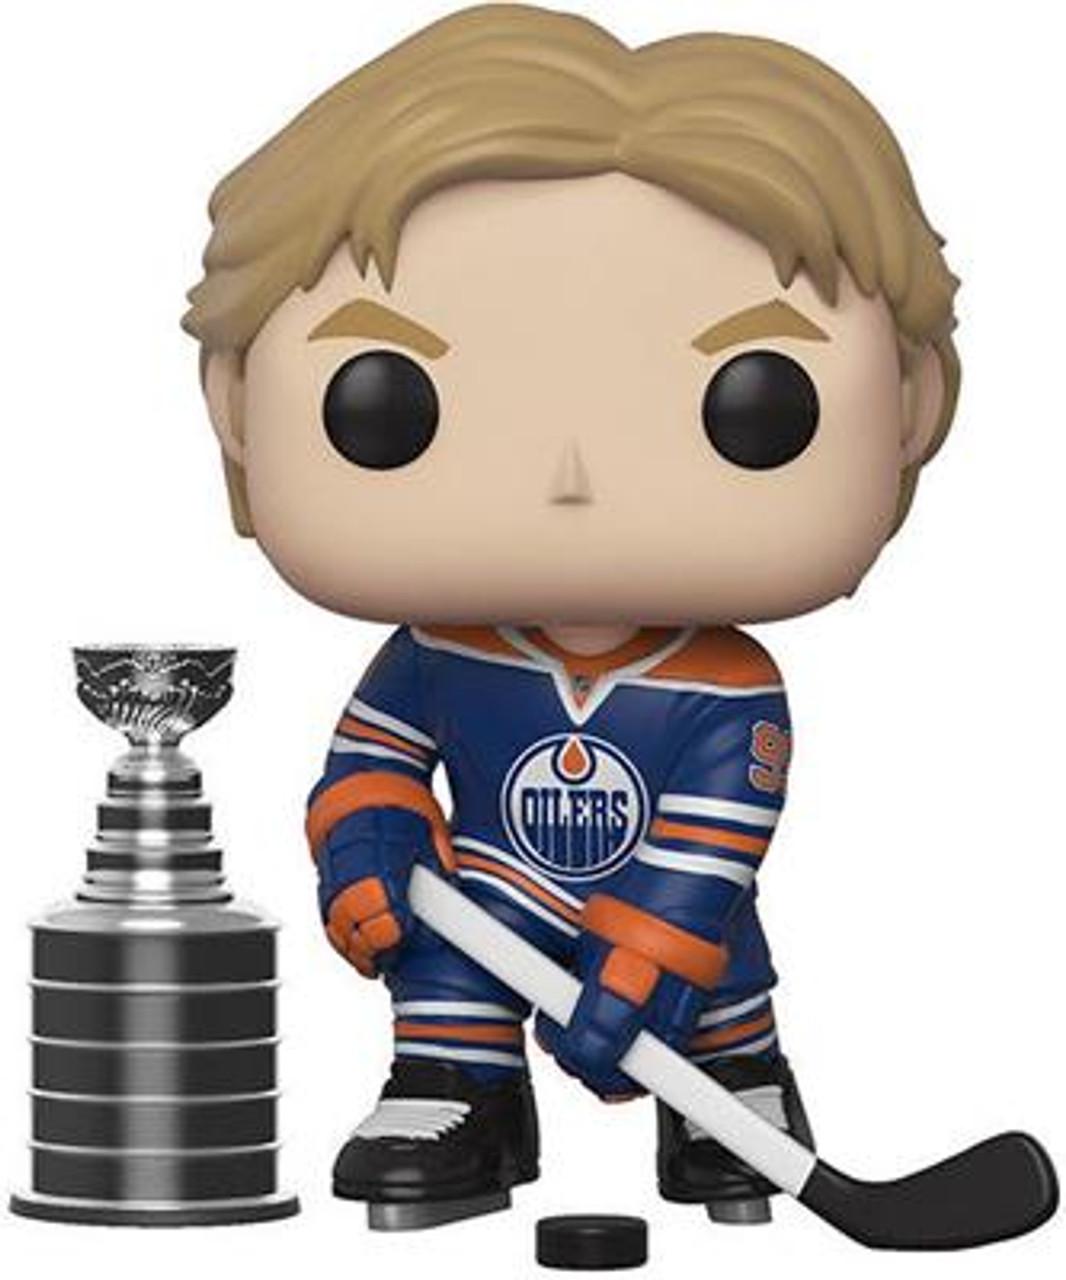 CHASE NHL Wayne Gretzky Edmonton Oilers Jersey Canada Exclusive Funko POP